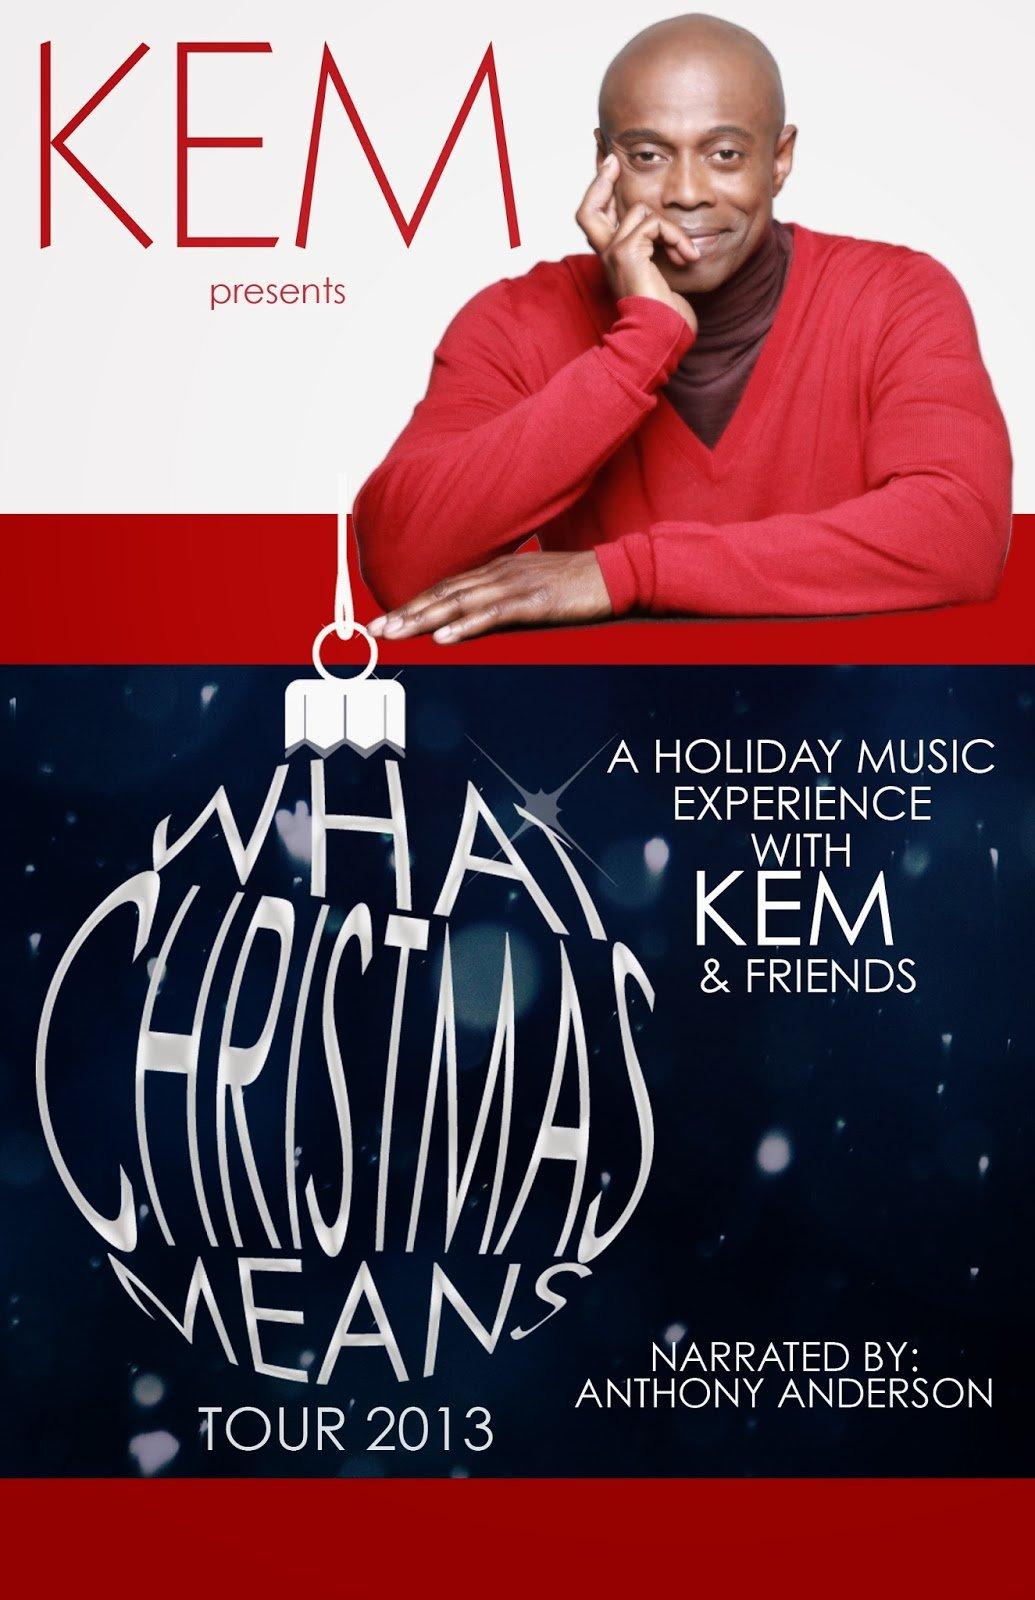 Kem & Friends Holiday Tour- Win Tickets and Meet Him!